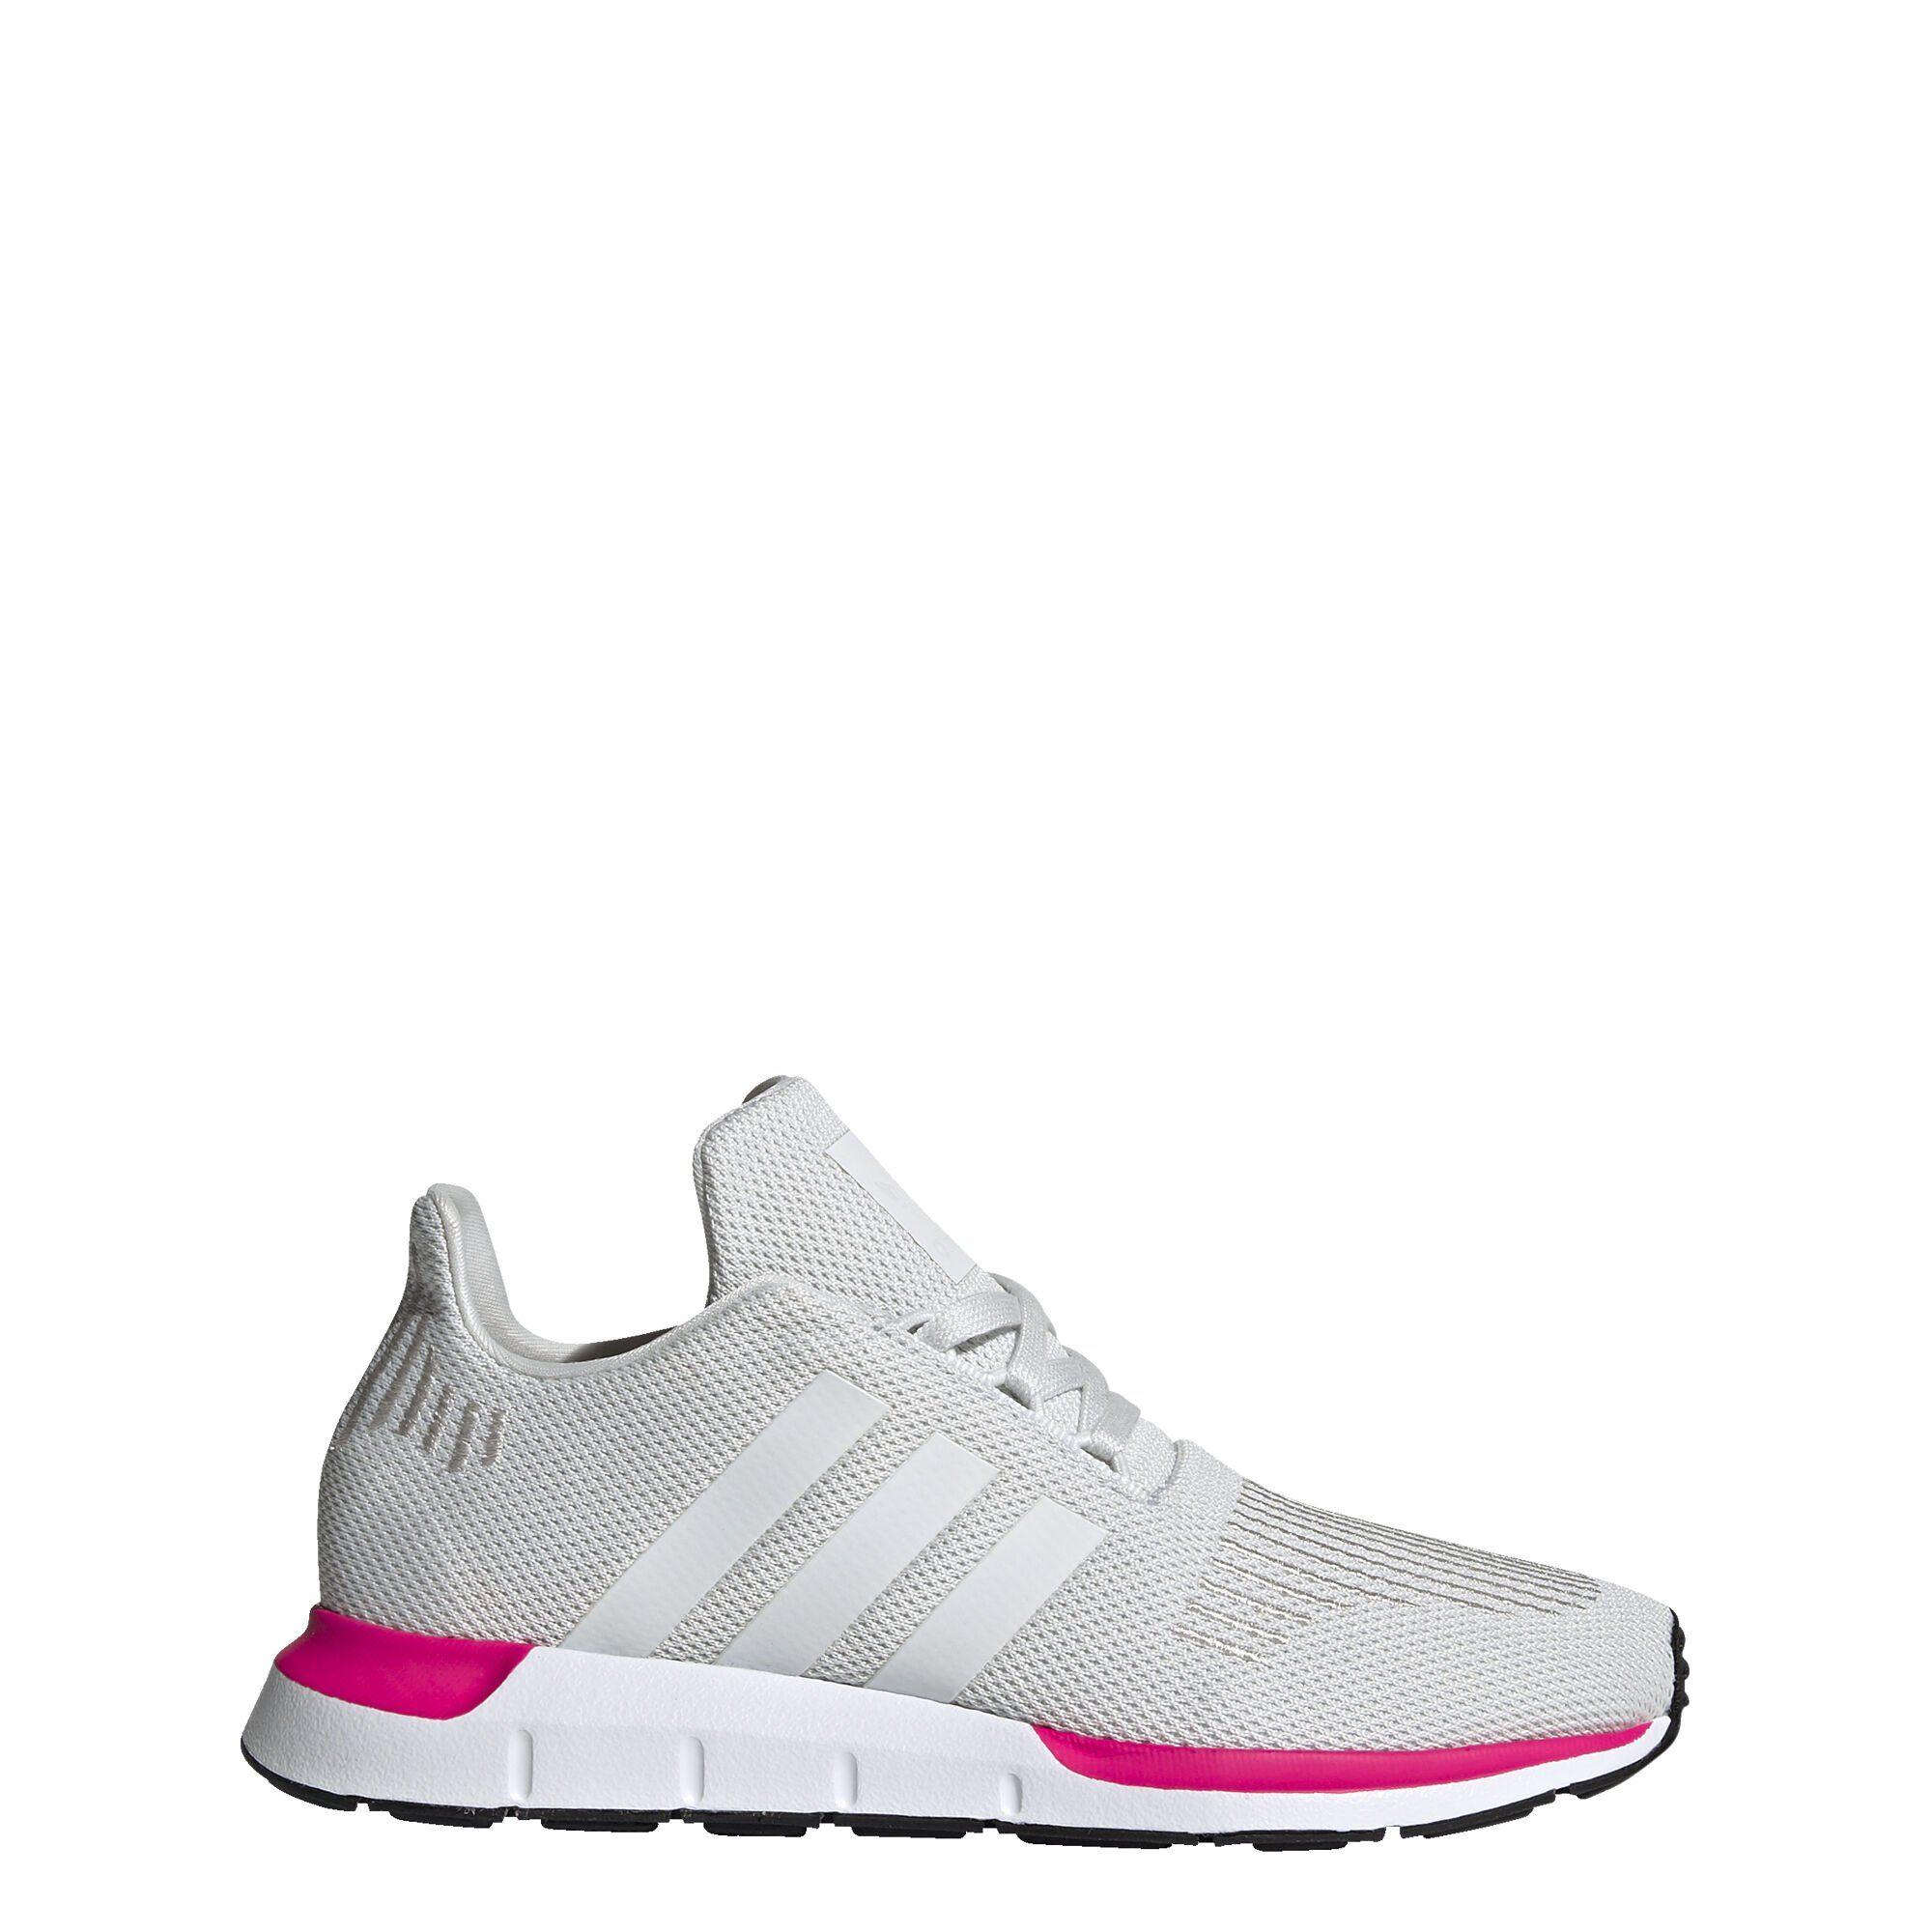 Schuh« Originals Adidas Sneaker »swift SwiftOtto Run uKJc1FTl35